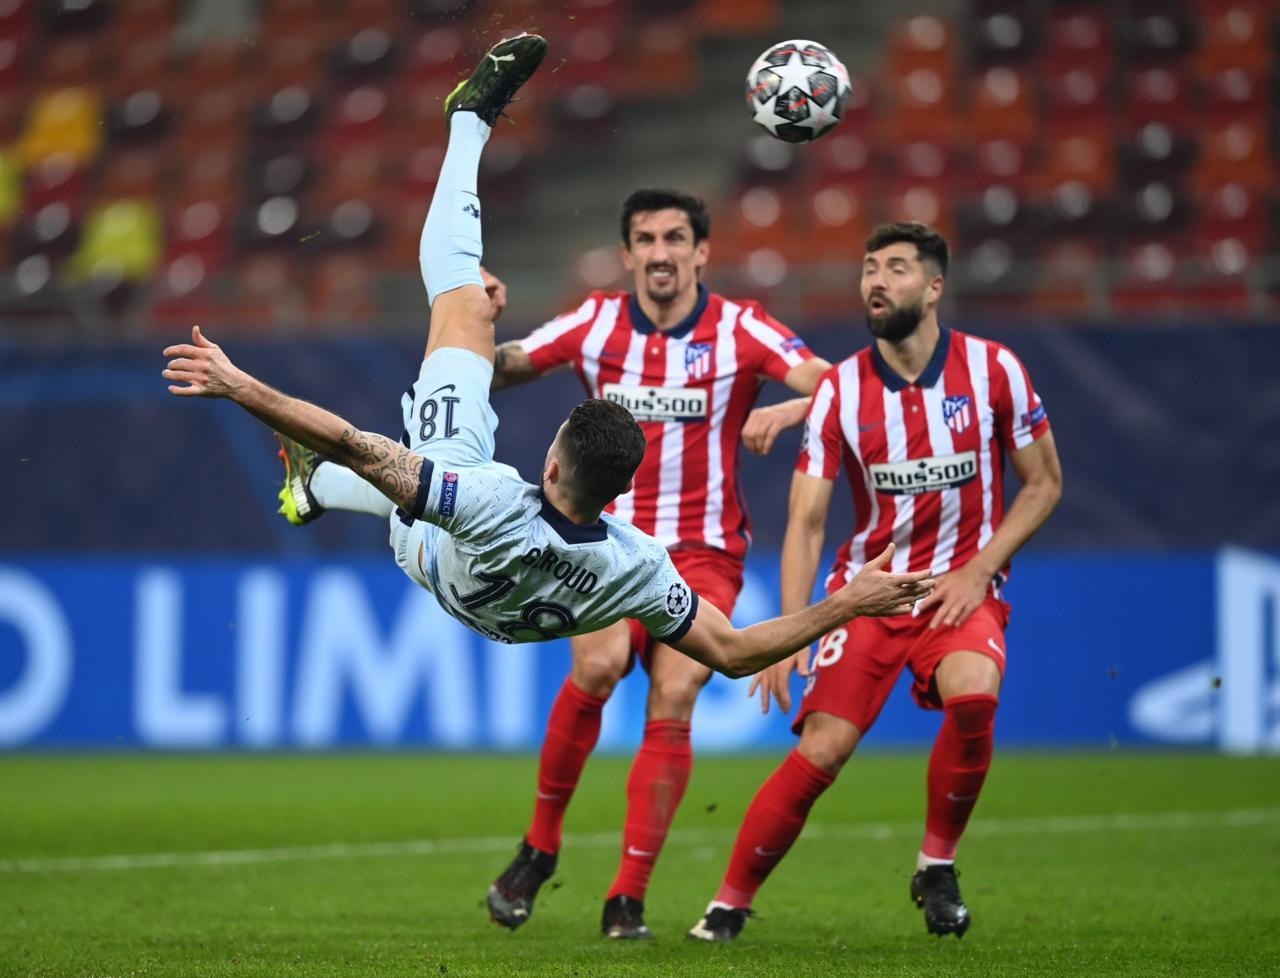 Chilena de Giroud para vencer al Atleti: Los goles que nos dejó la Champions League